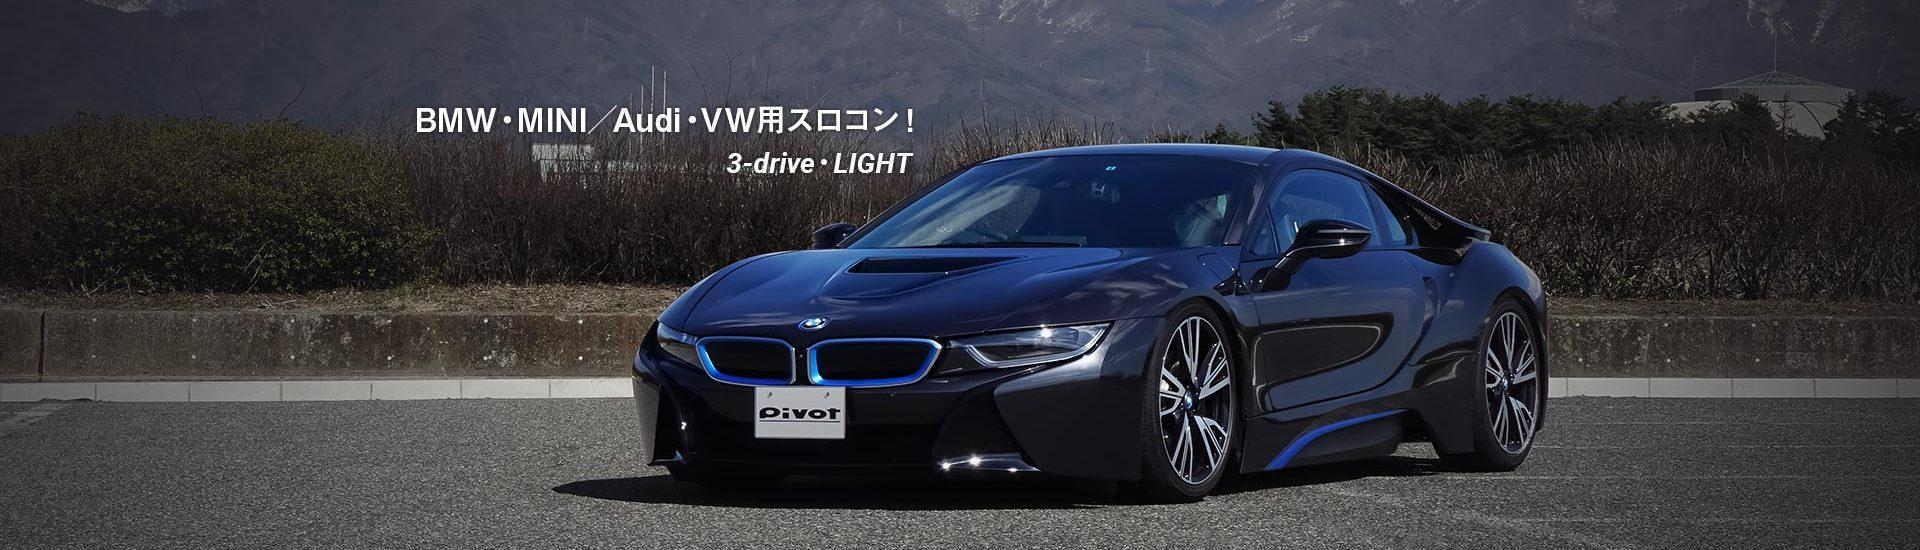 3-drive・LIGHT